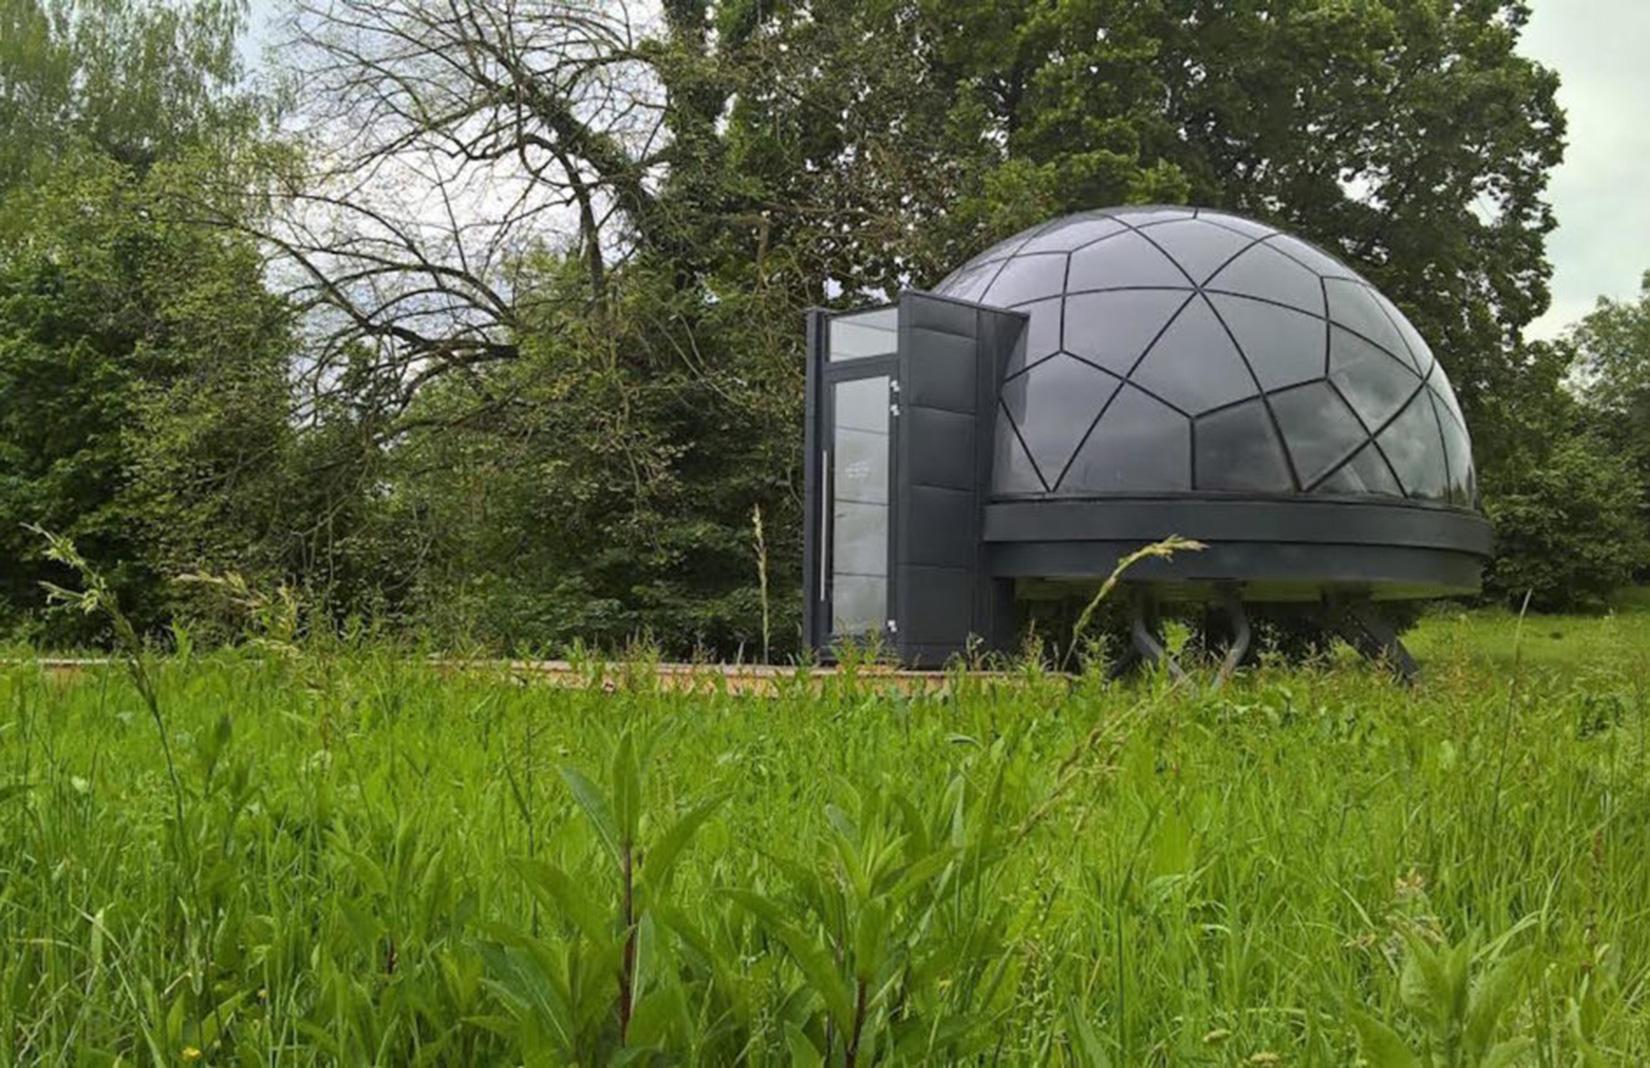 Smartdome tiny home